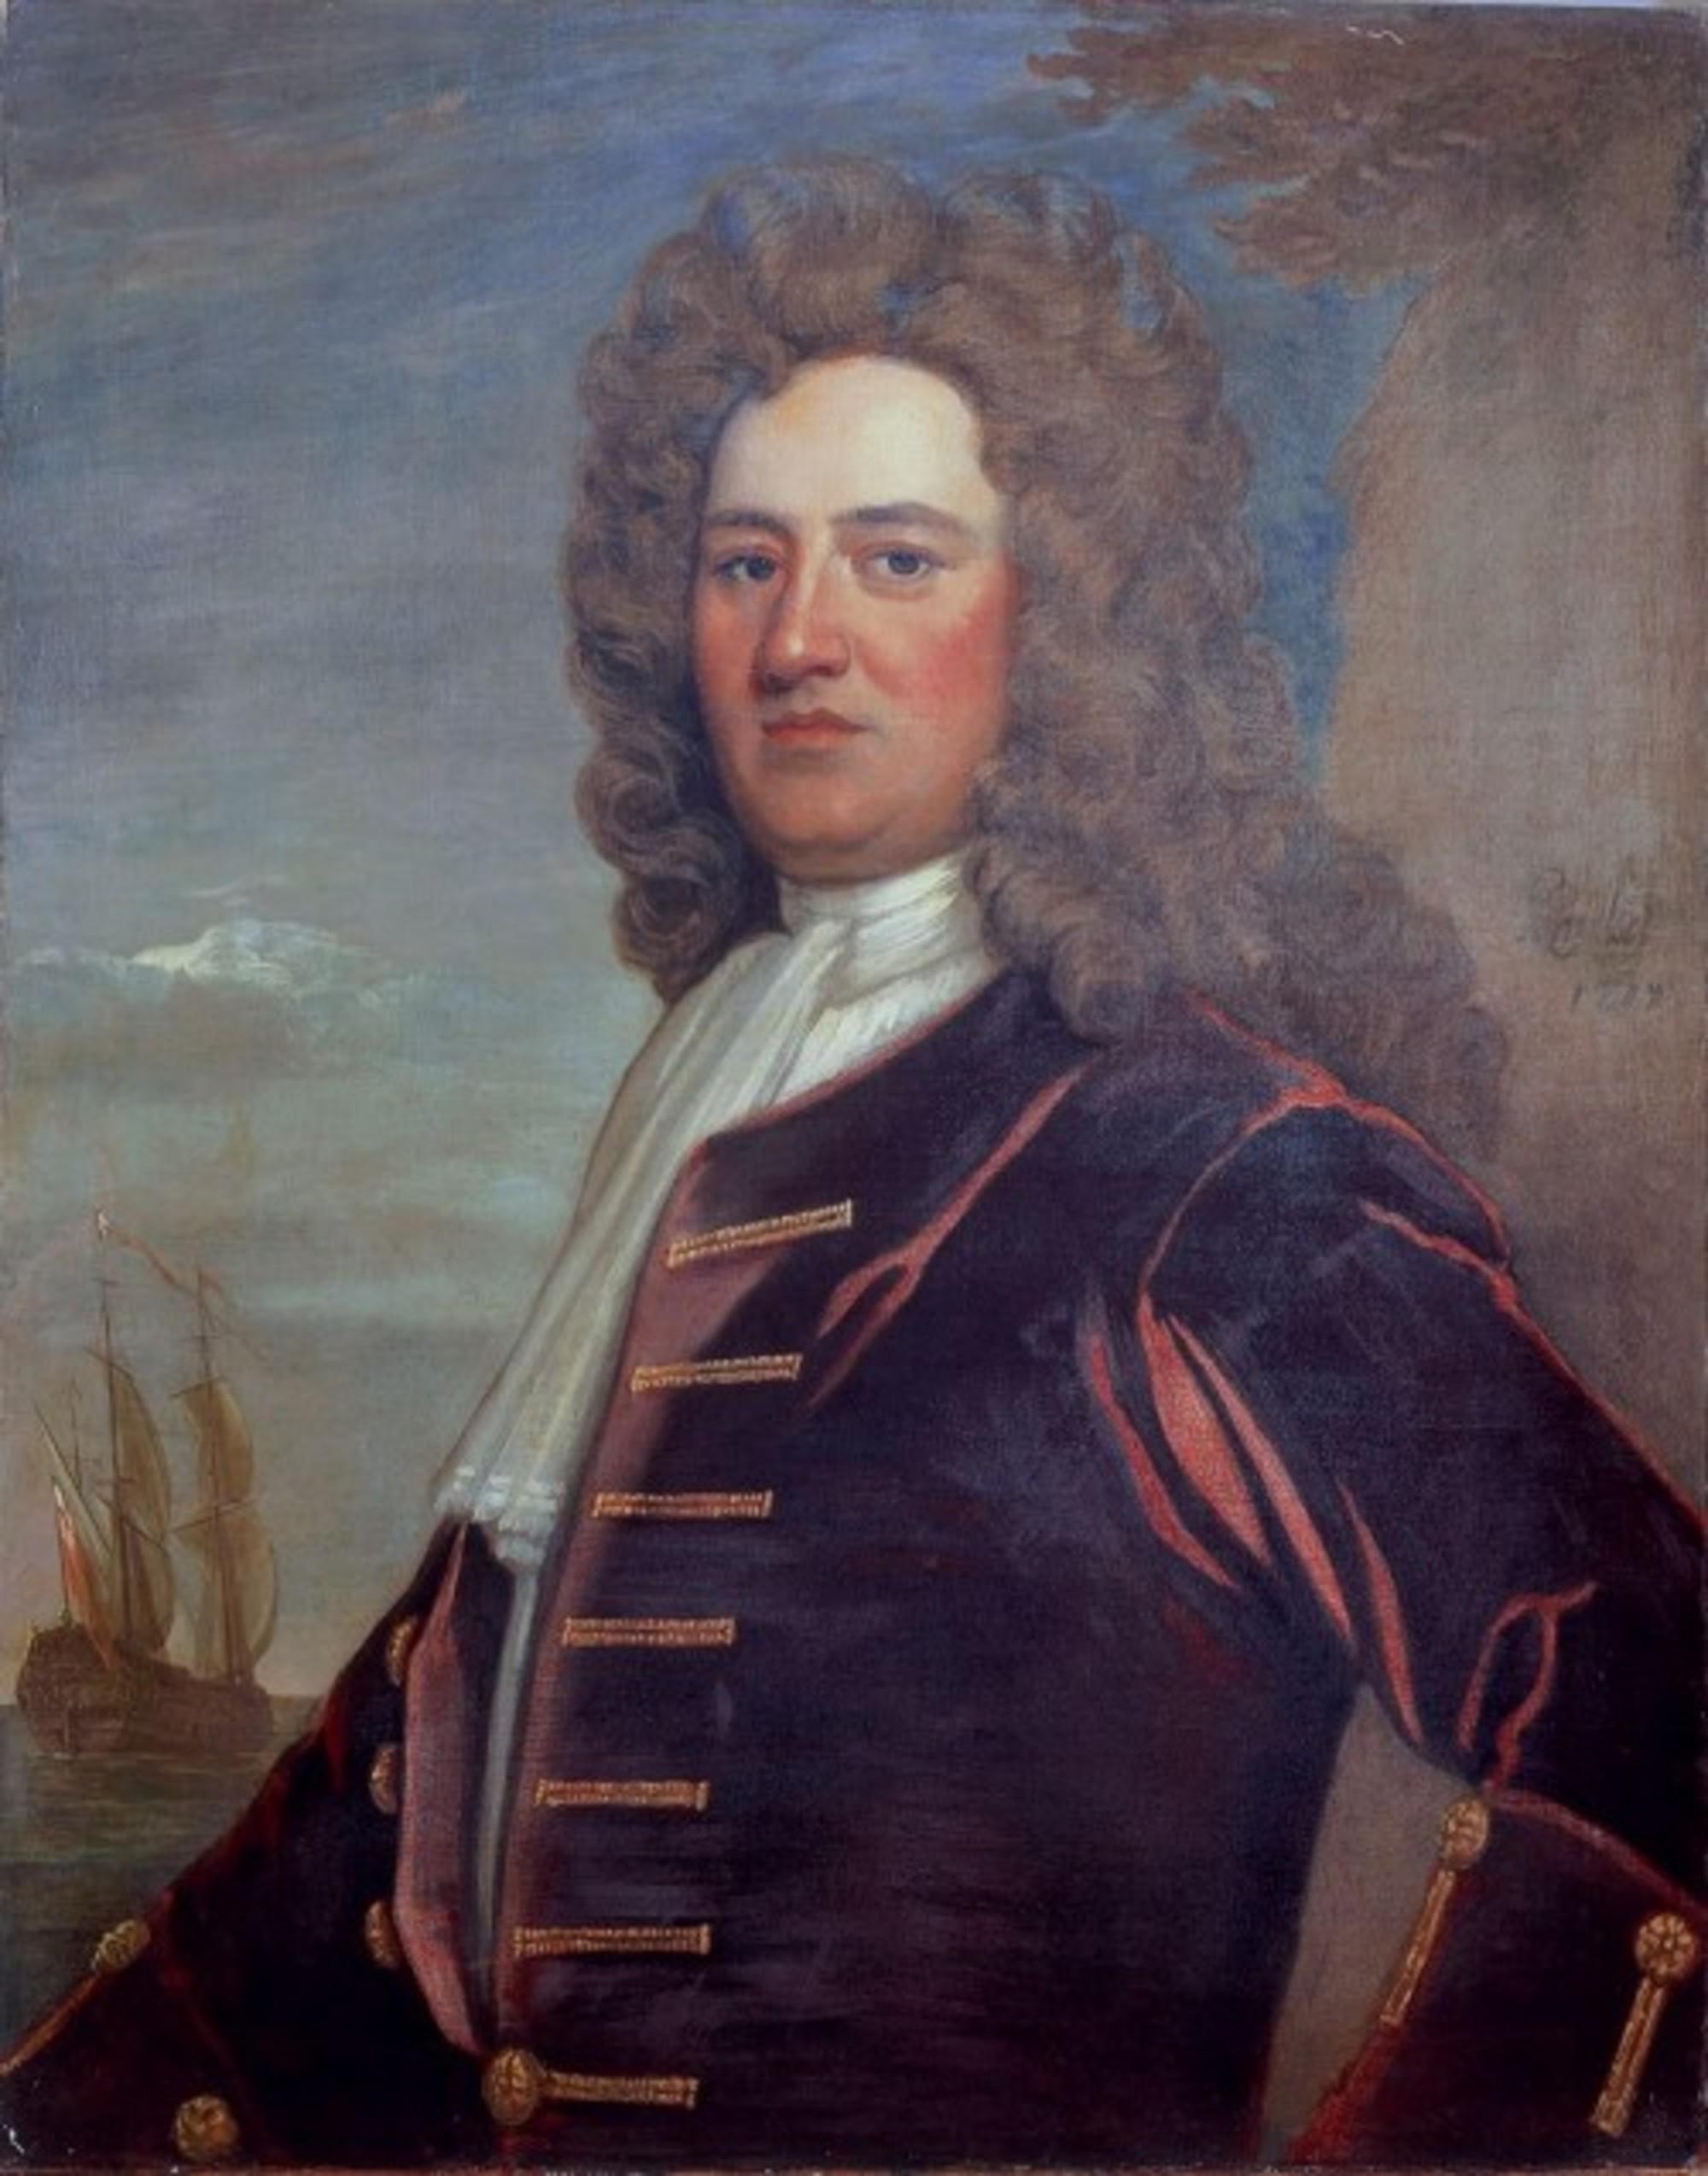 Vice-Admiral-Edward-Hopson-1671-1728-RMG-BHC2781.jpg